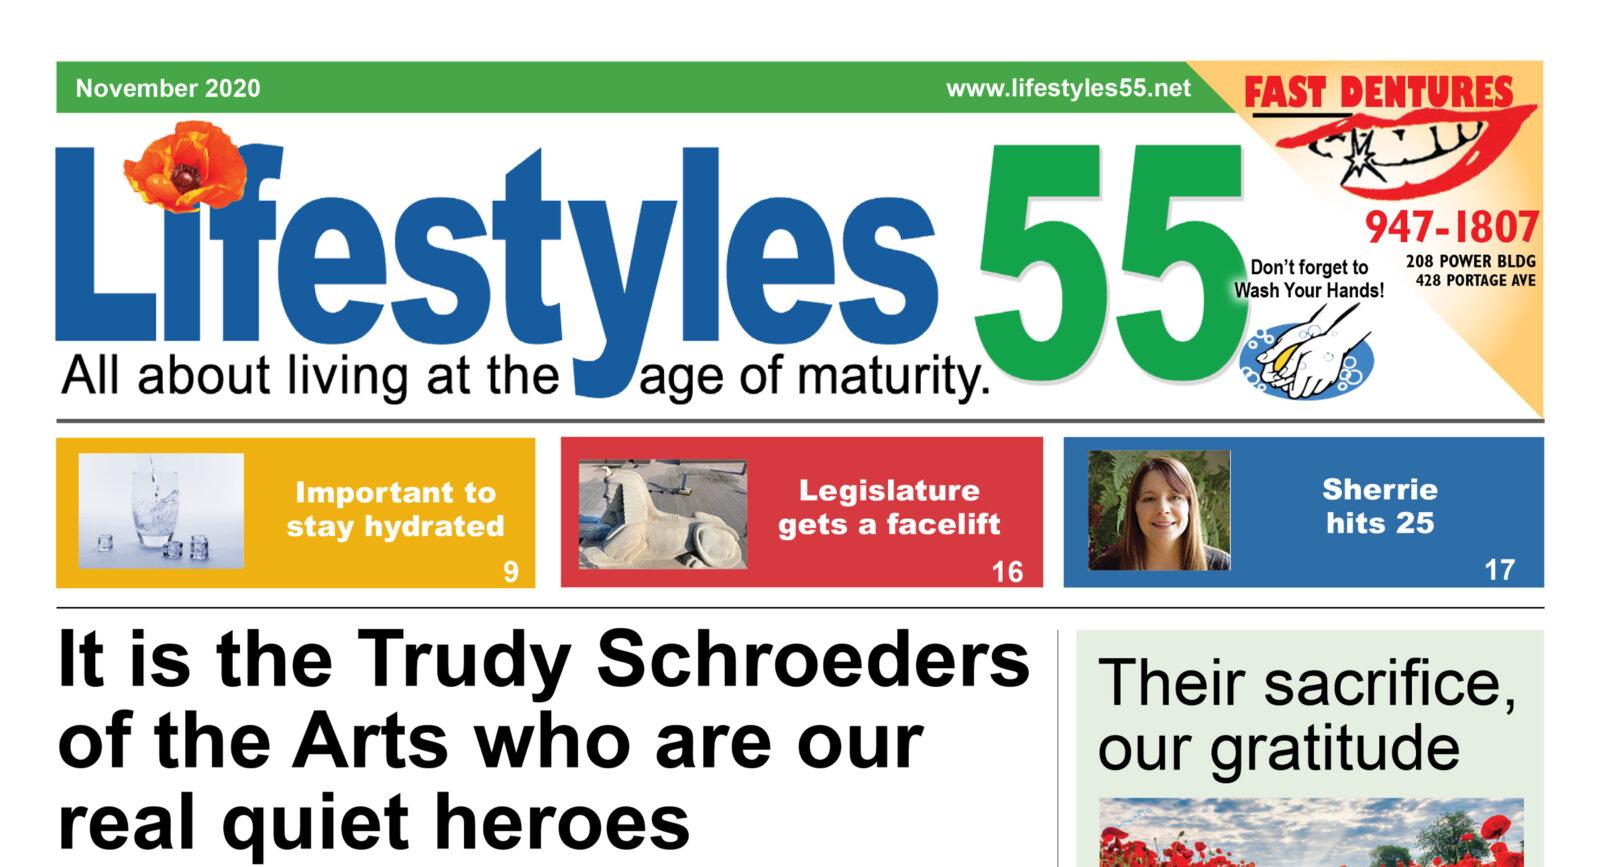 Lifestyles 55 November 2020 issue